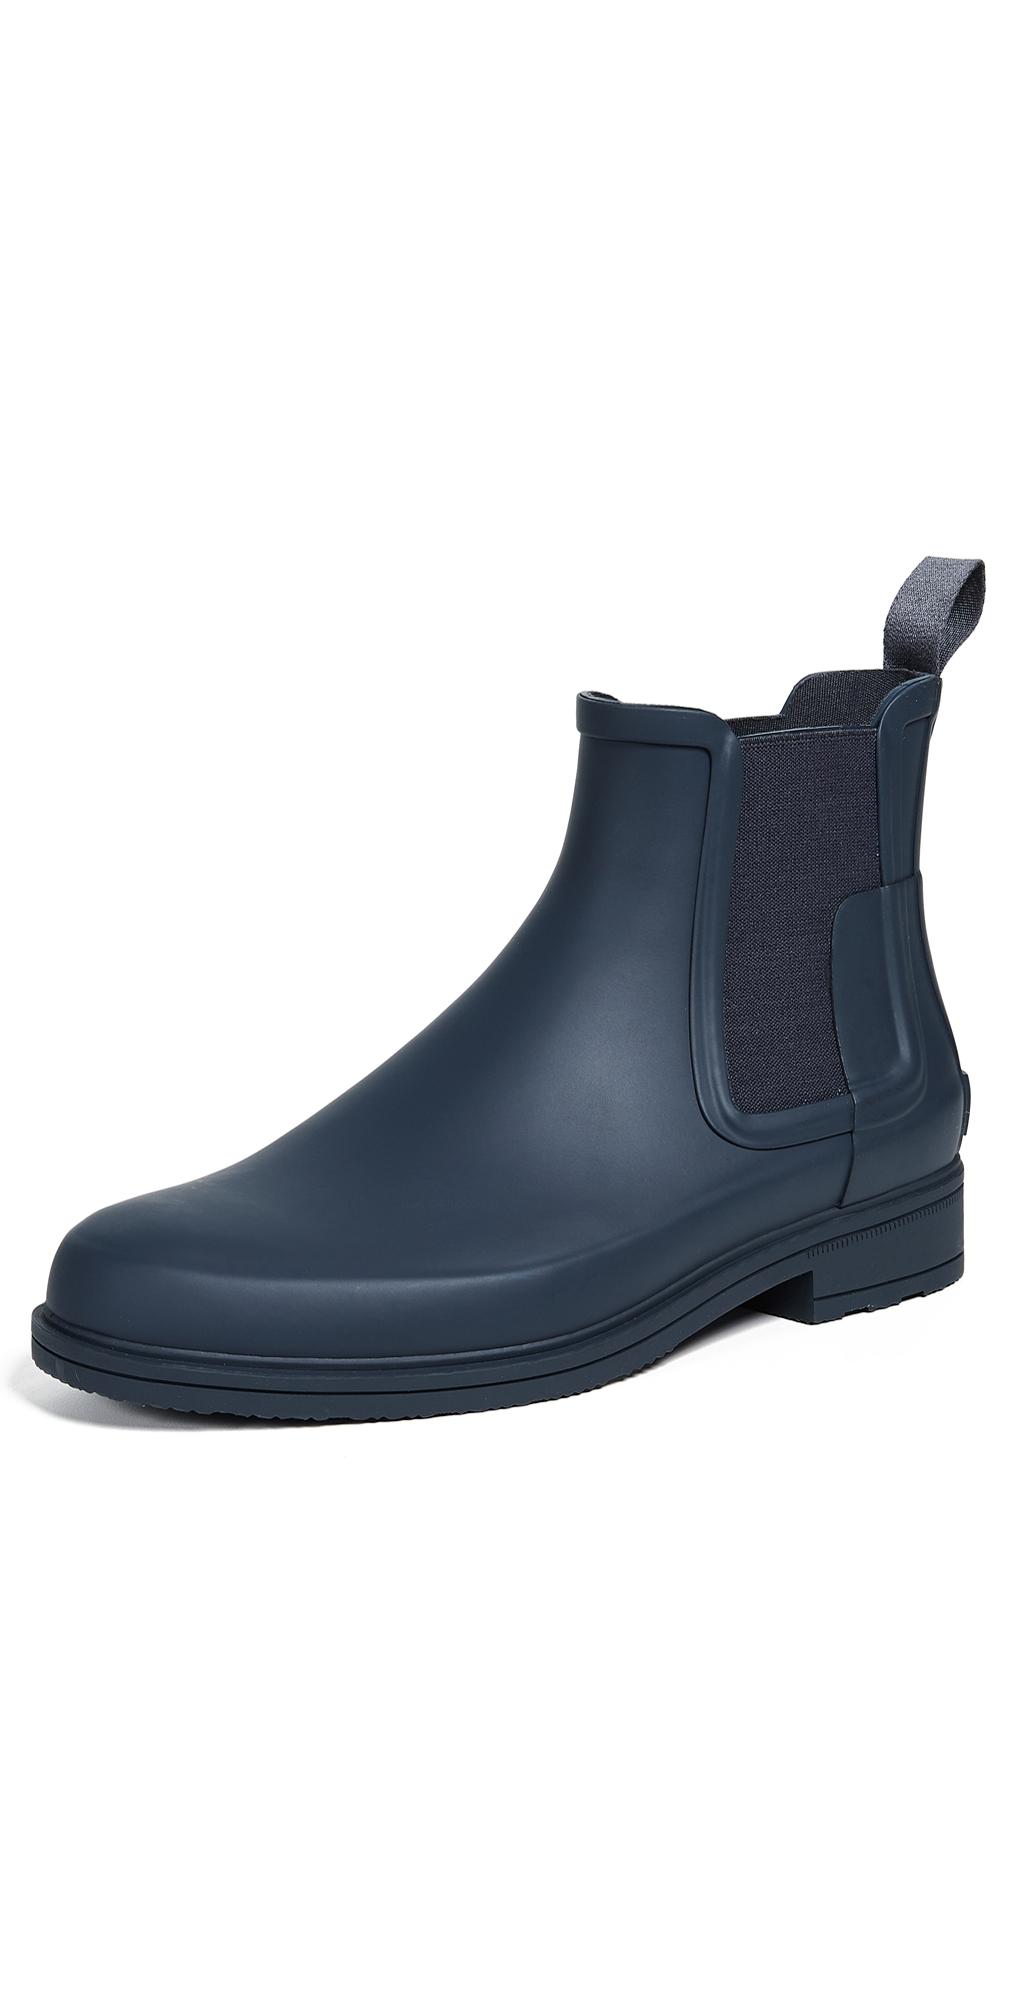 Original Refined Rubber Chelsea Boots